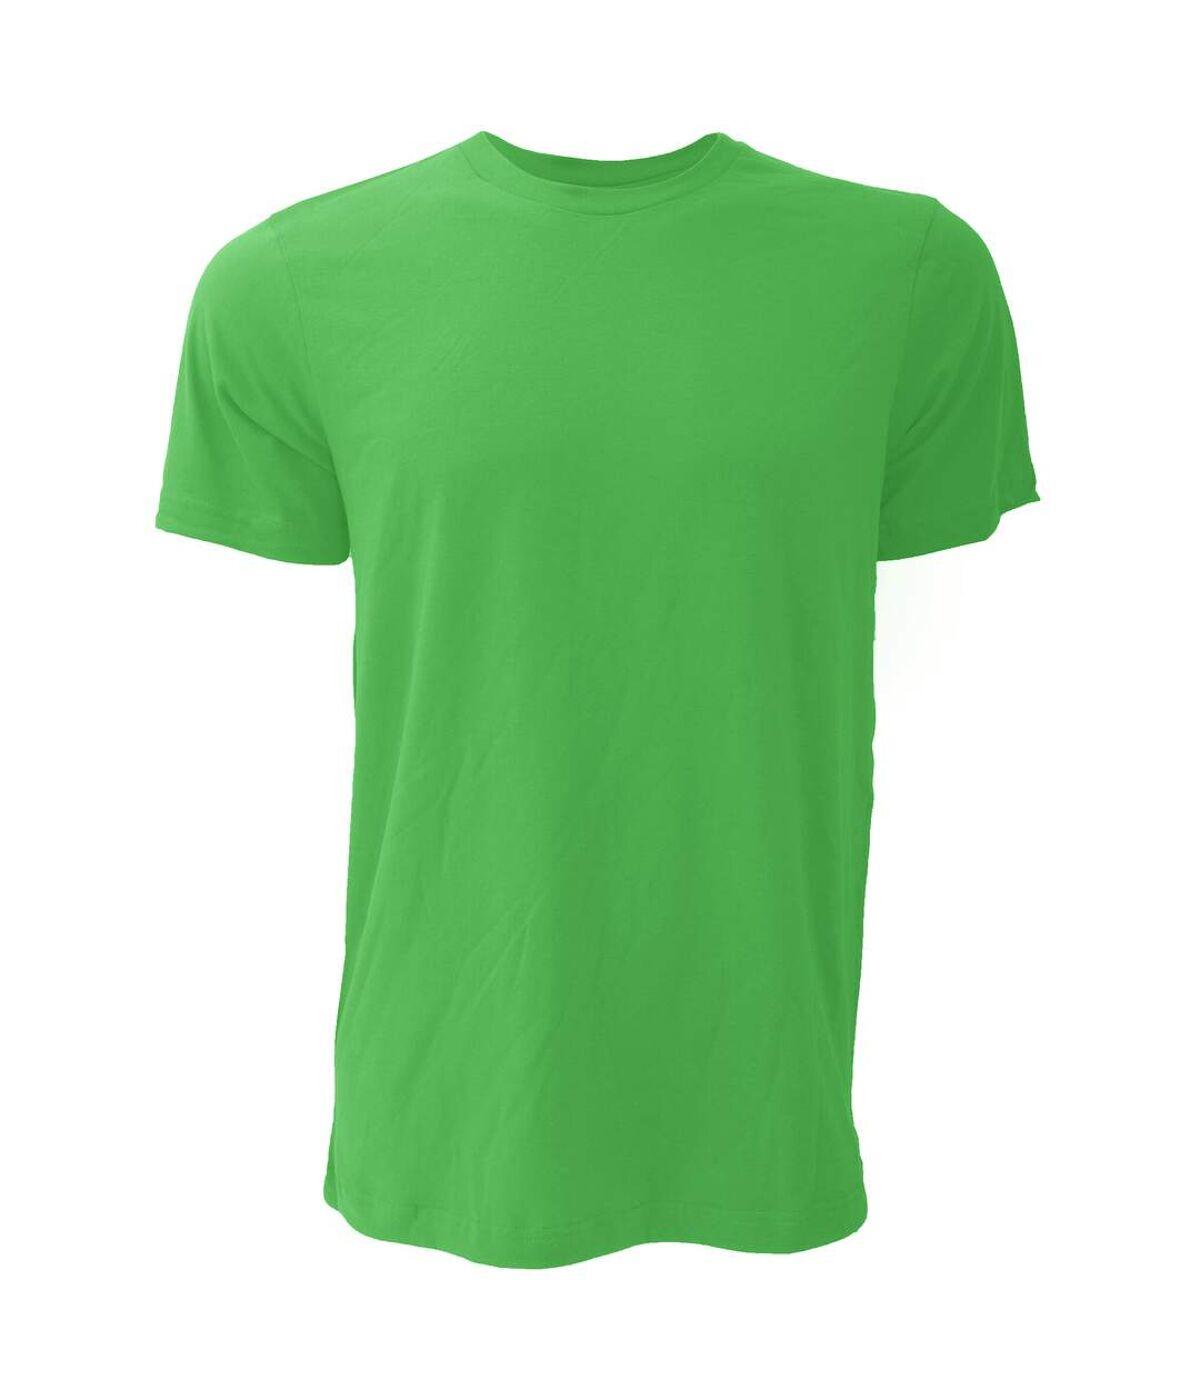 Canvas Unisex Jersey Crew Neck T-Shirt / Mens Short Sleeve T-Shirt (Kelly Green) - UTBC163